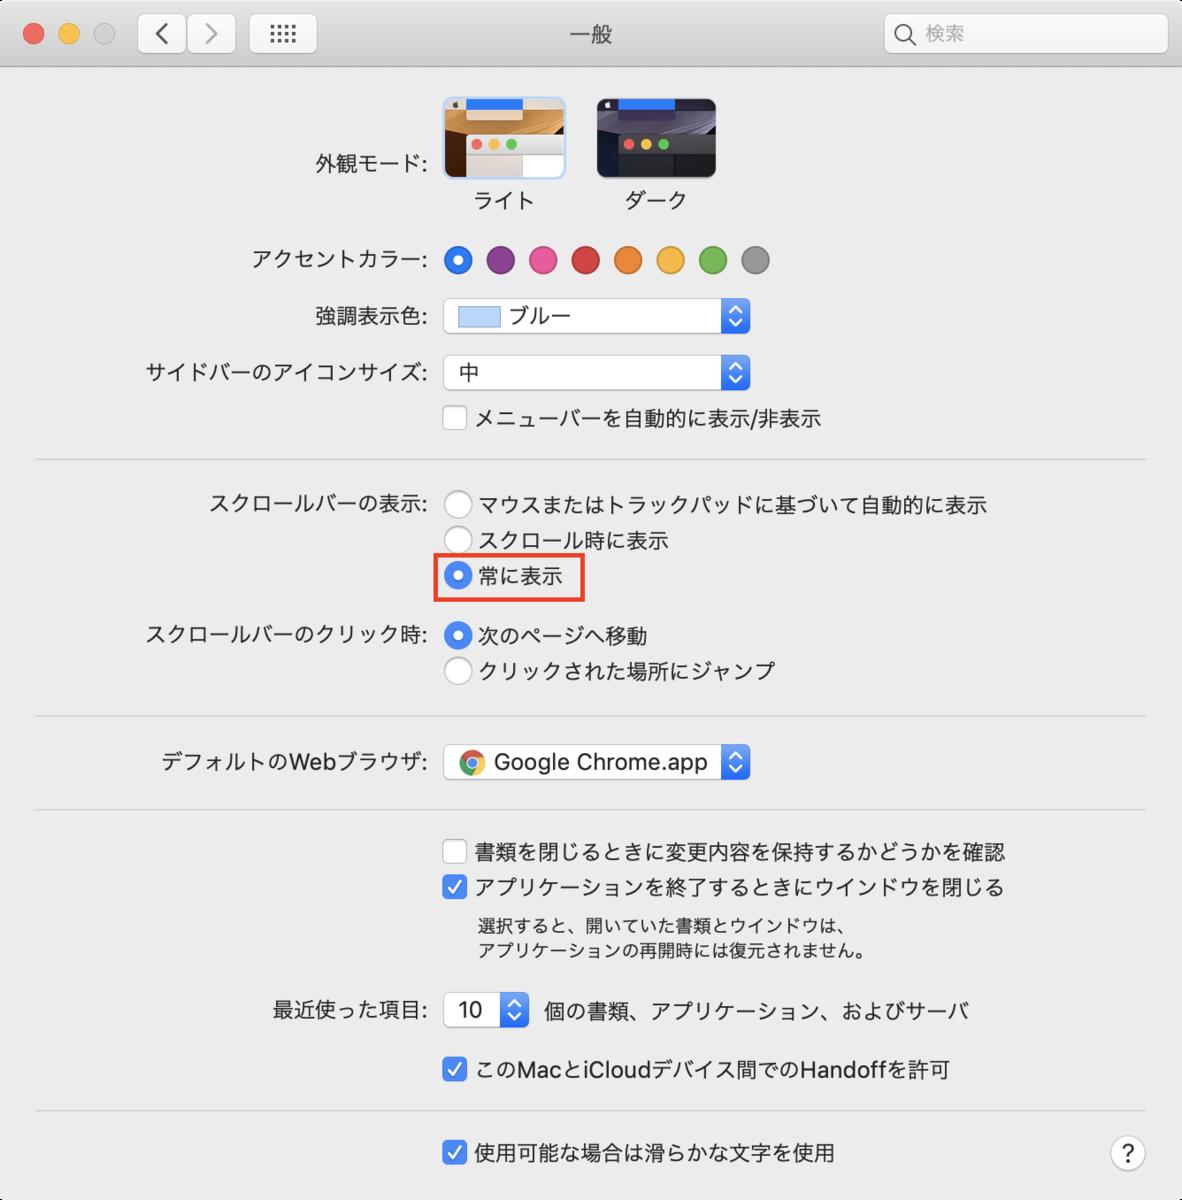 f:id:nini_y:20200405173032p:plain